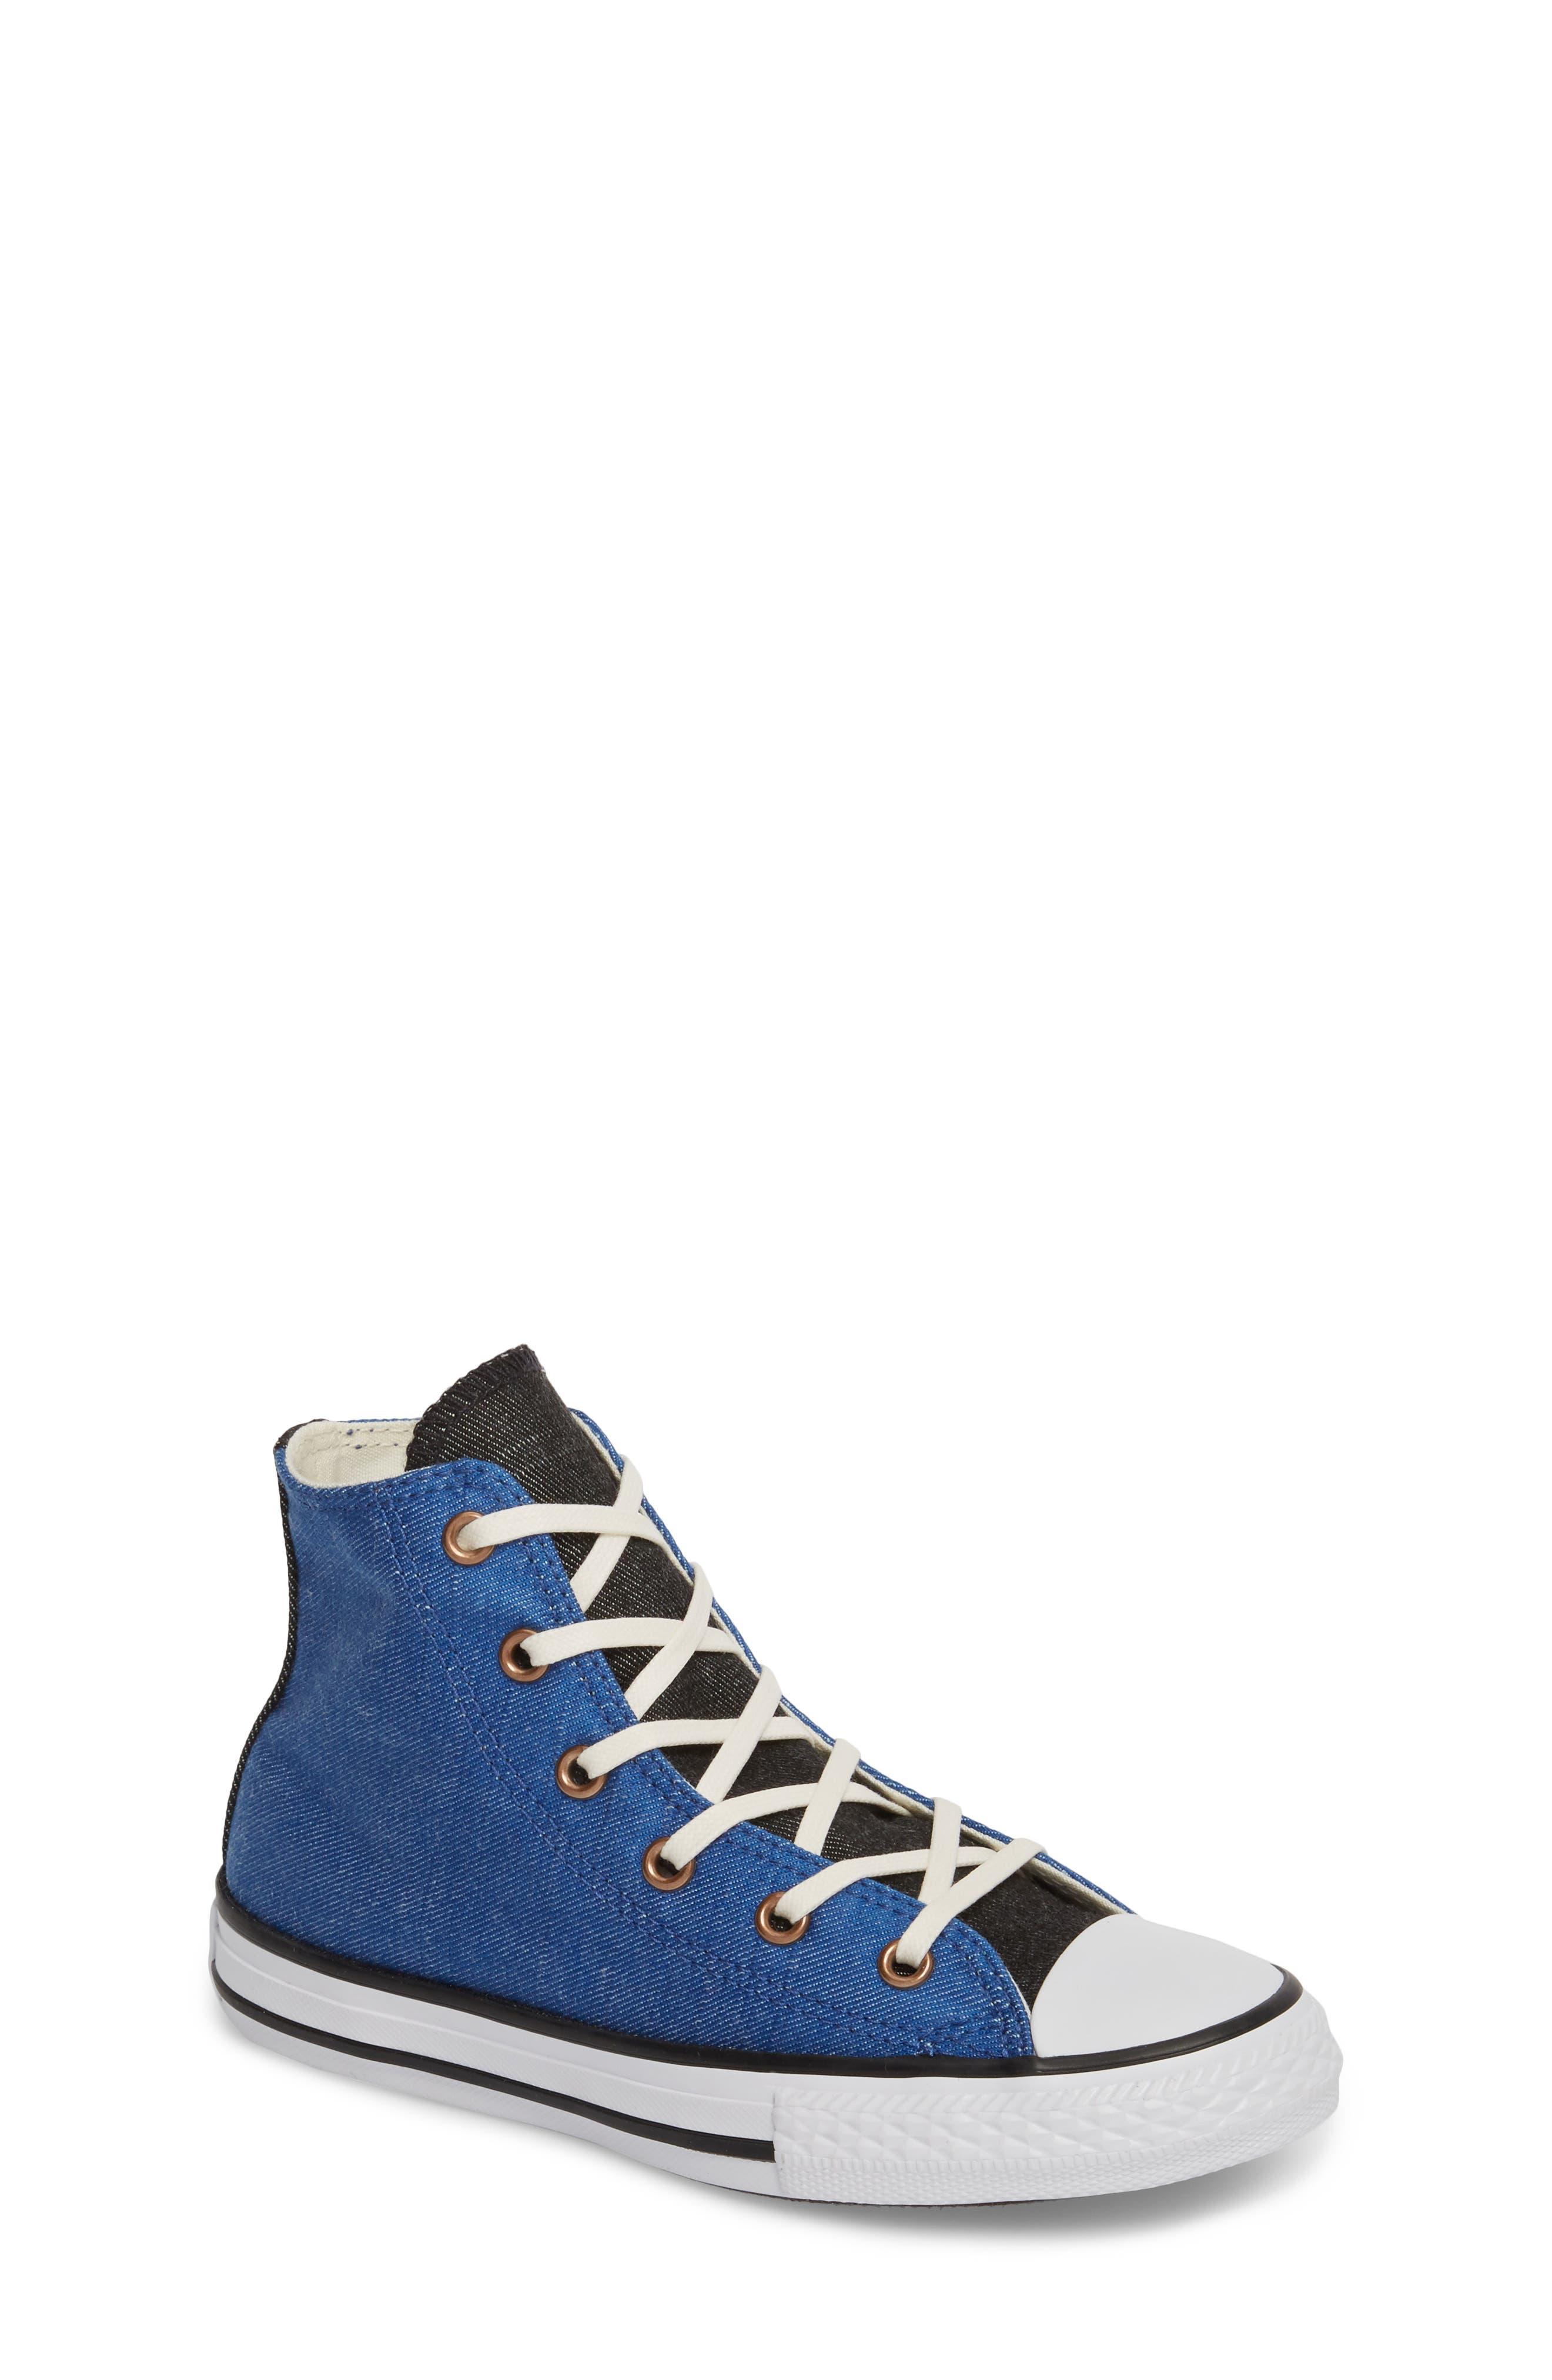 Chuck Taylor<sup>®</sup> All Star<sup>®</sup> Chambray High Top Sneaker,                         Main,                         color, Nightfall Blue